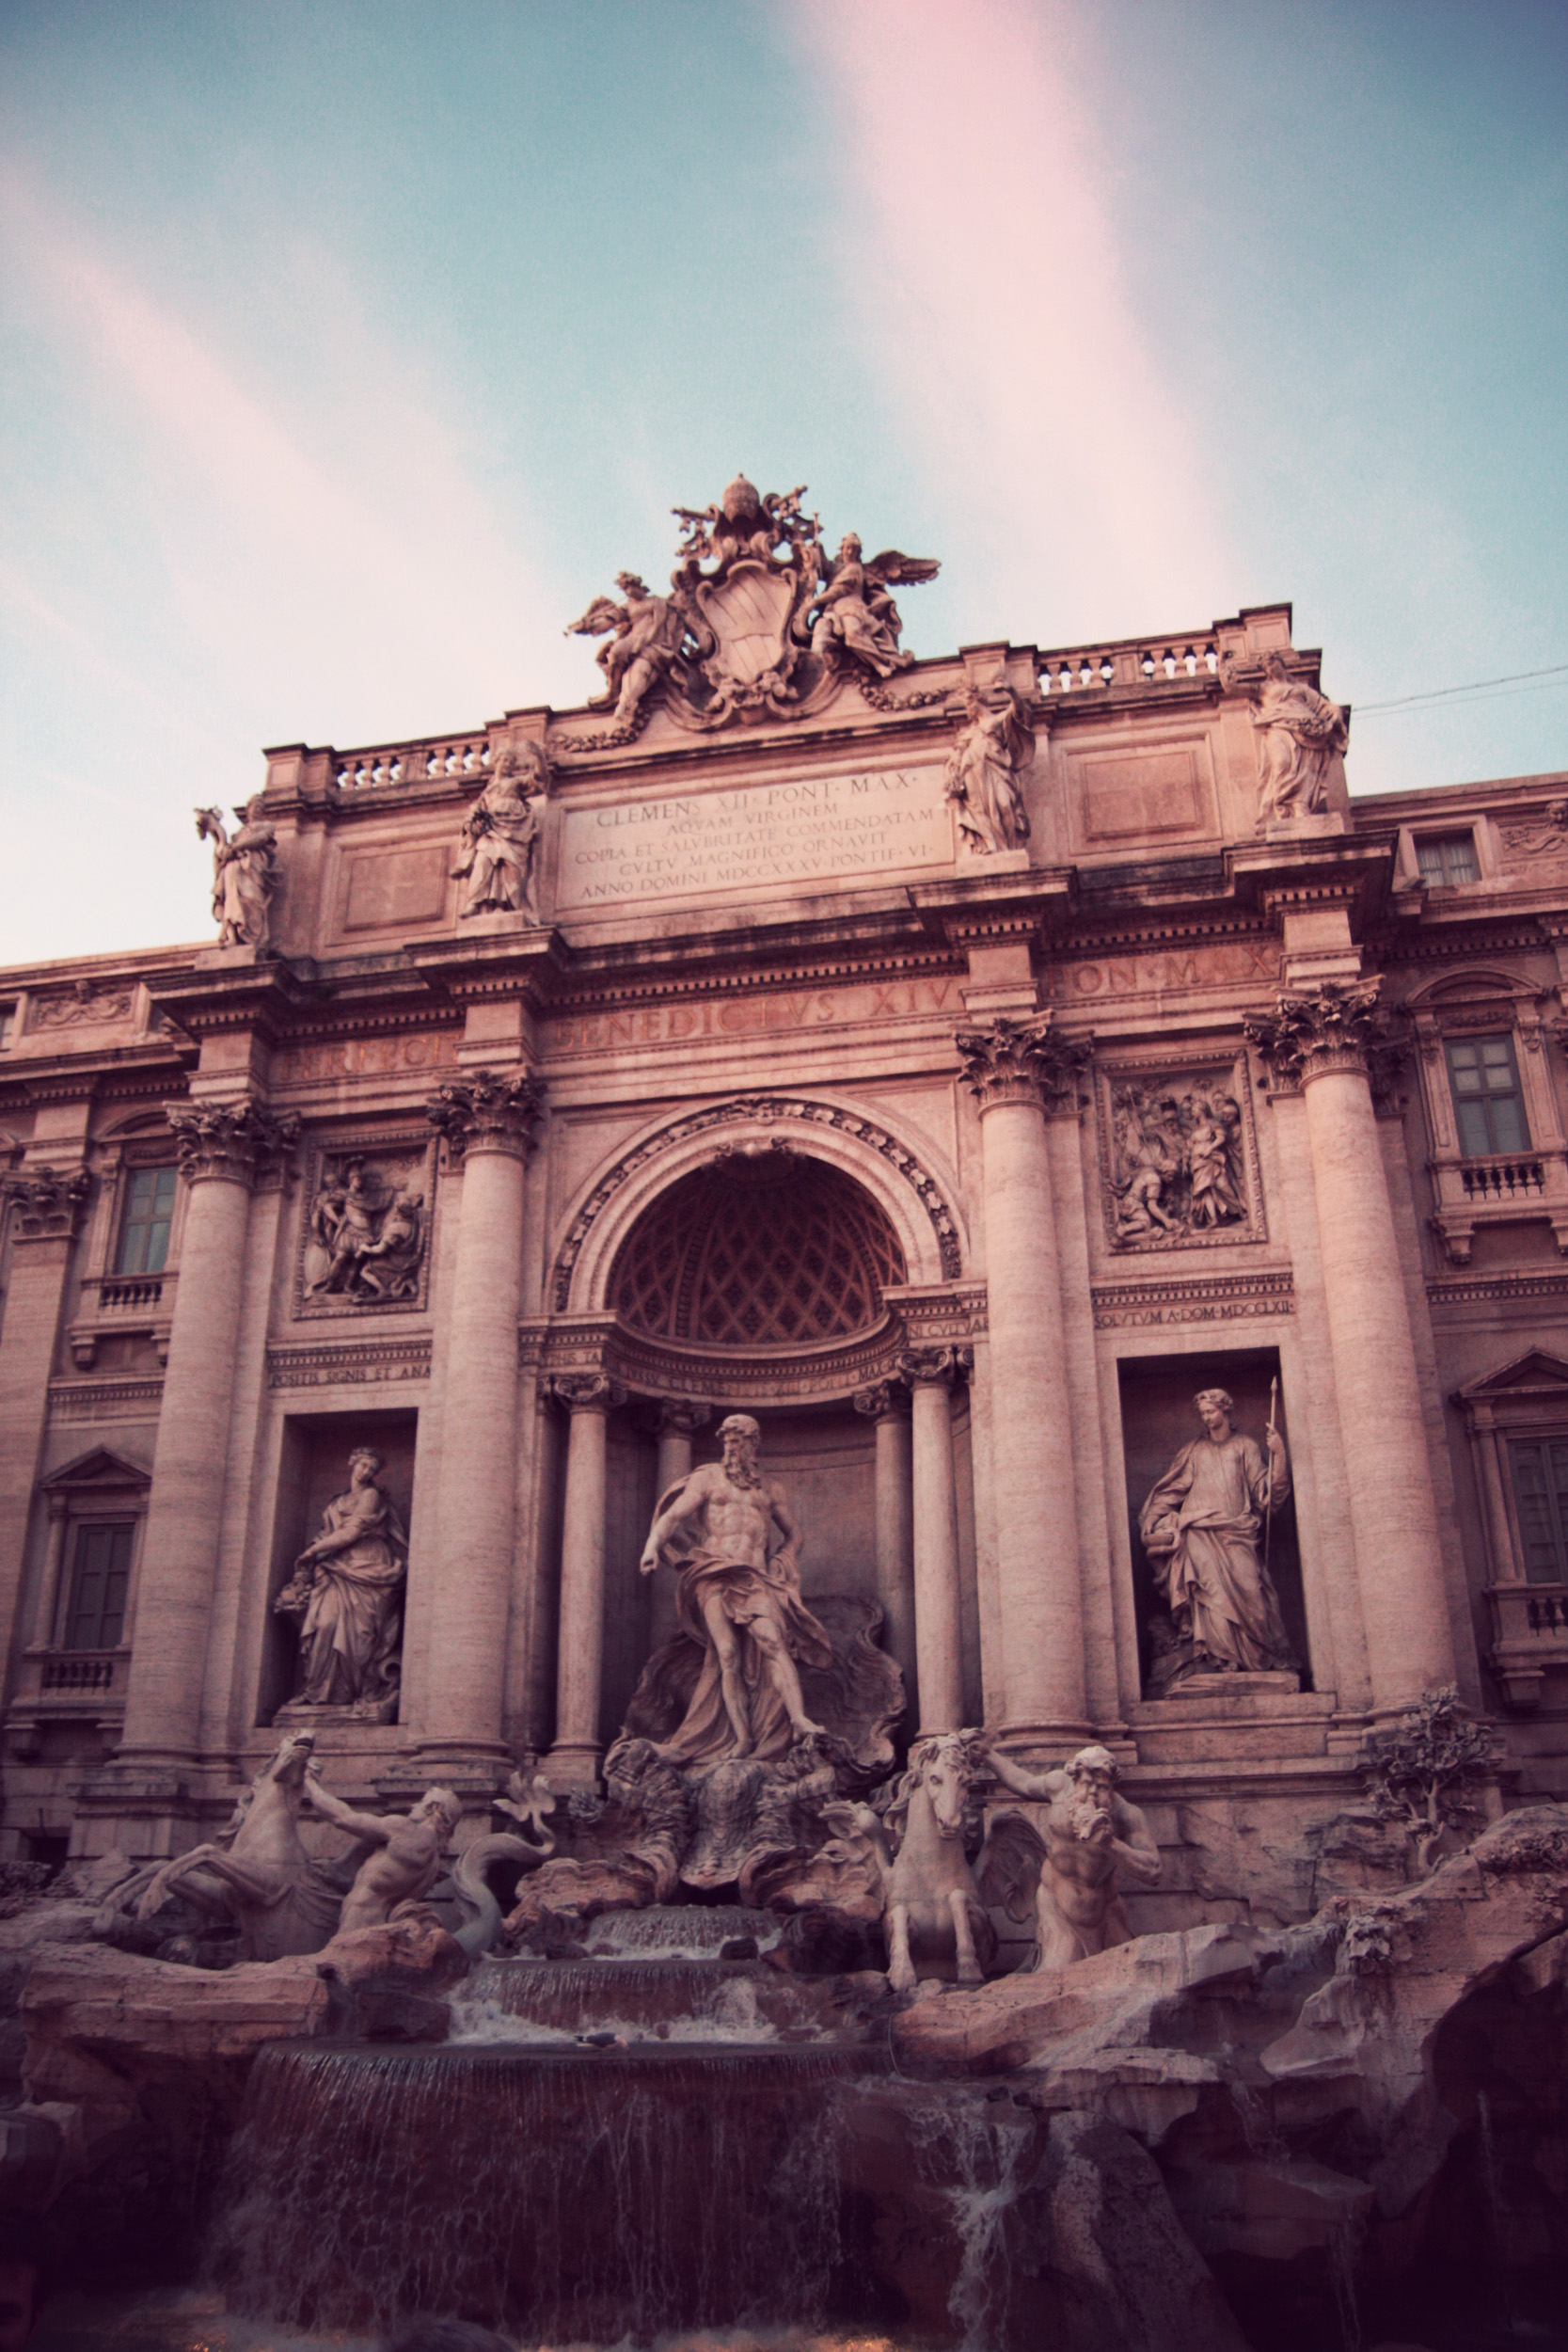 ROMA_Trevi Fountain_02.jpg